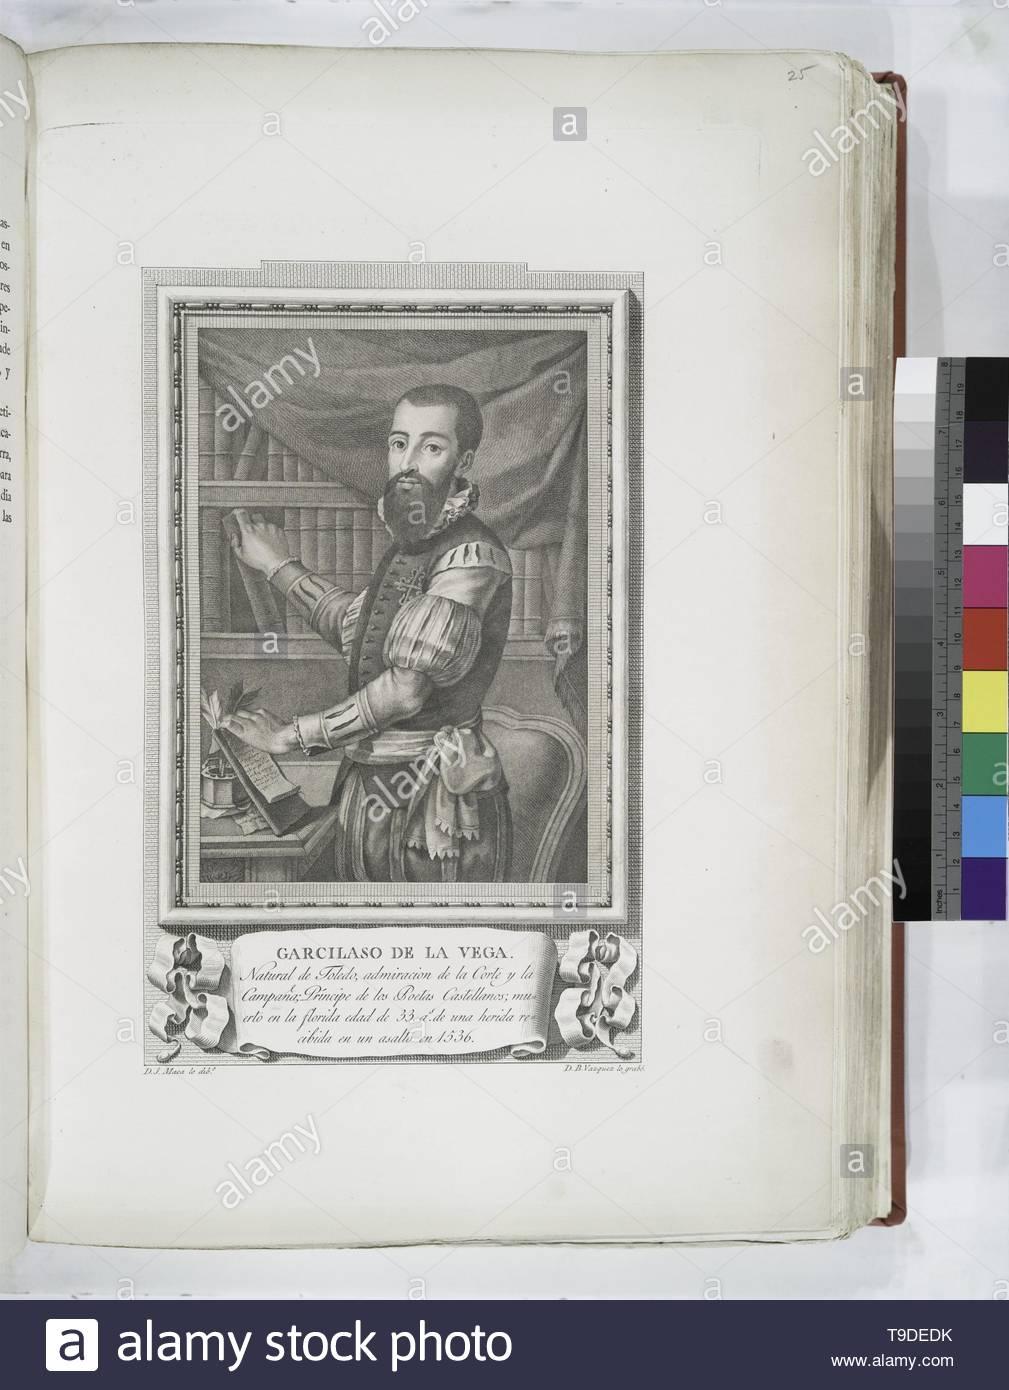 Maea,José(1759-1826)-Garcilaso de la Vega - Stock Image